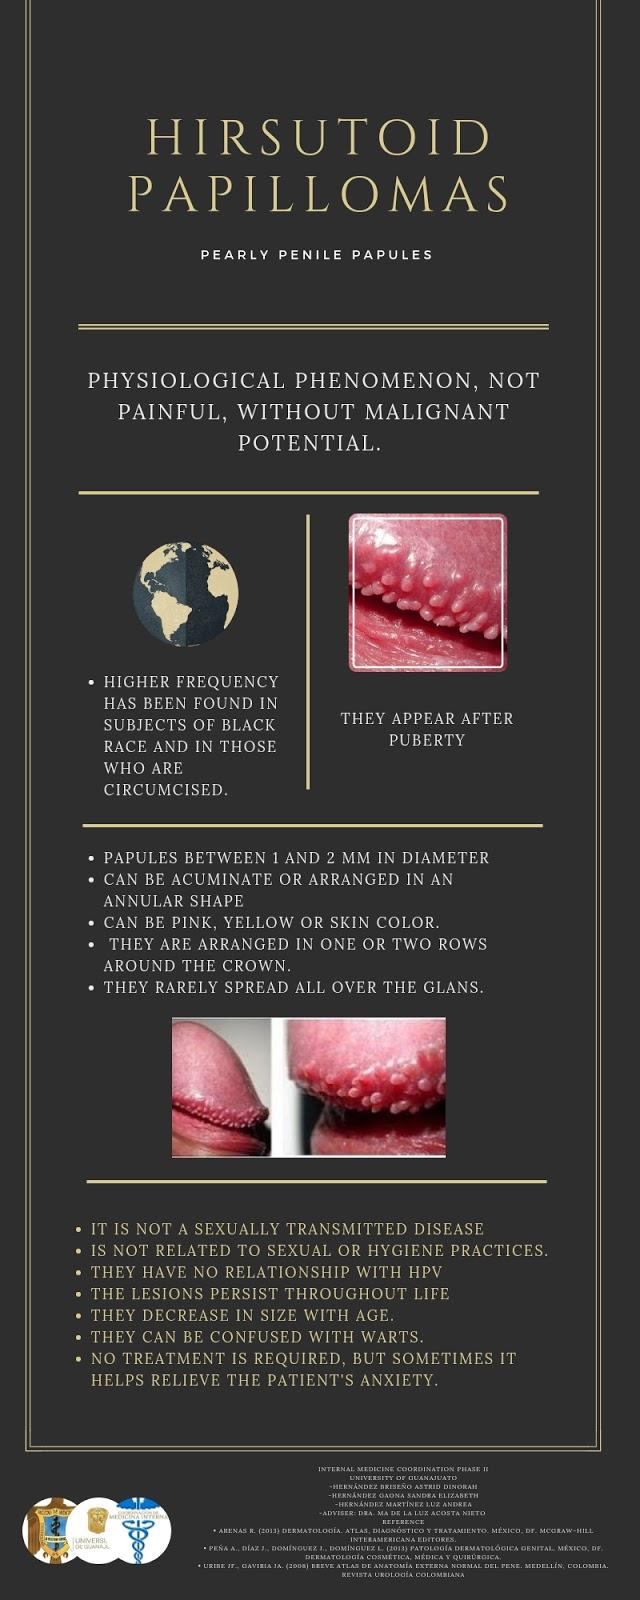 papiloma hirsutoide definicion boli dentare